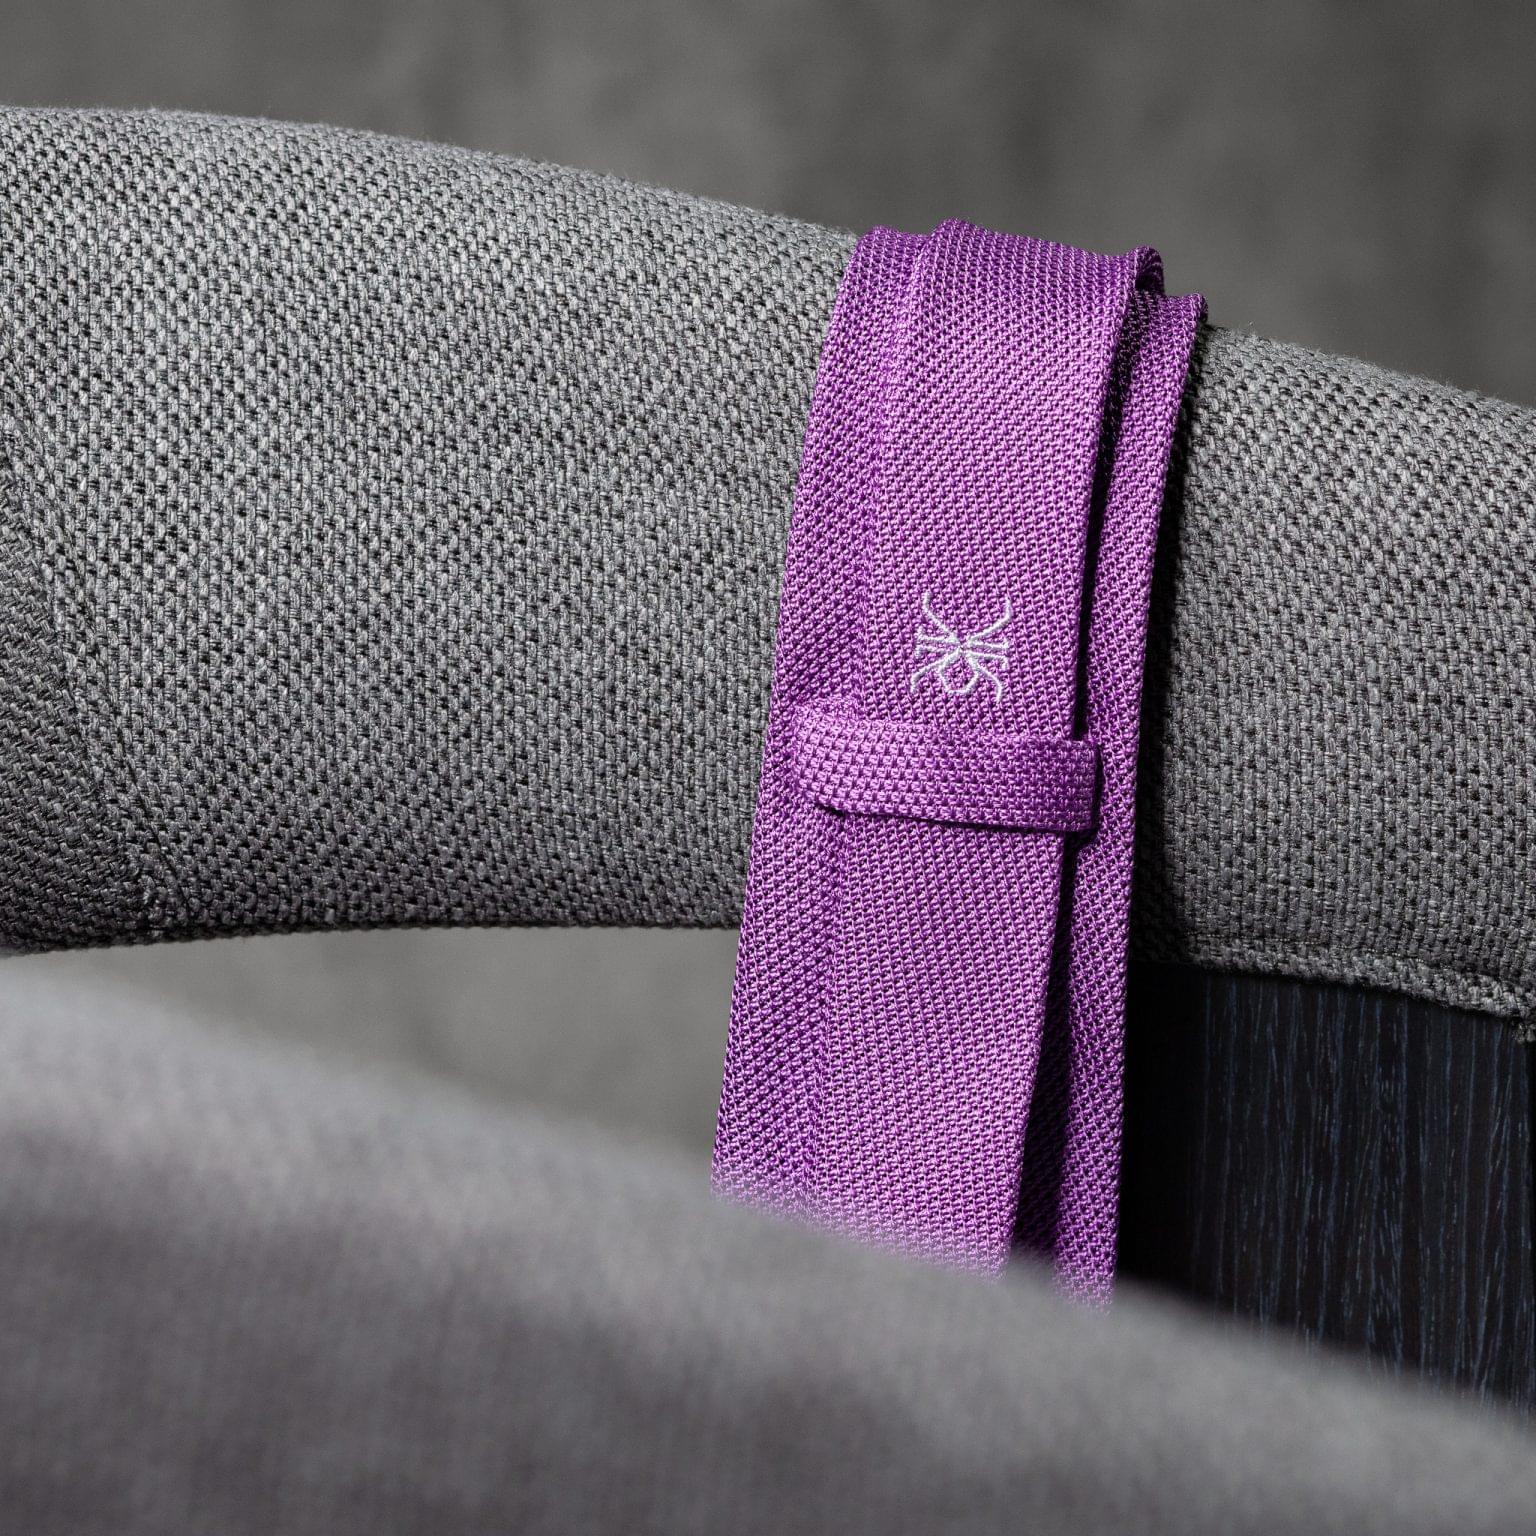 GRENADINE-0154-Tie-Initials-Corbata-Iniciales-The-Seelk-4